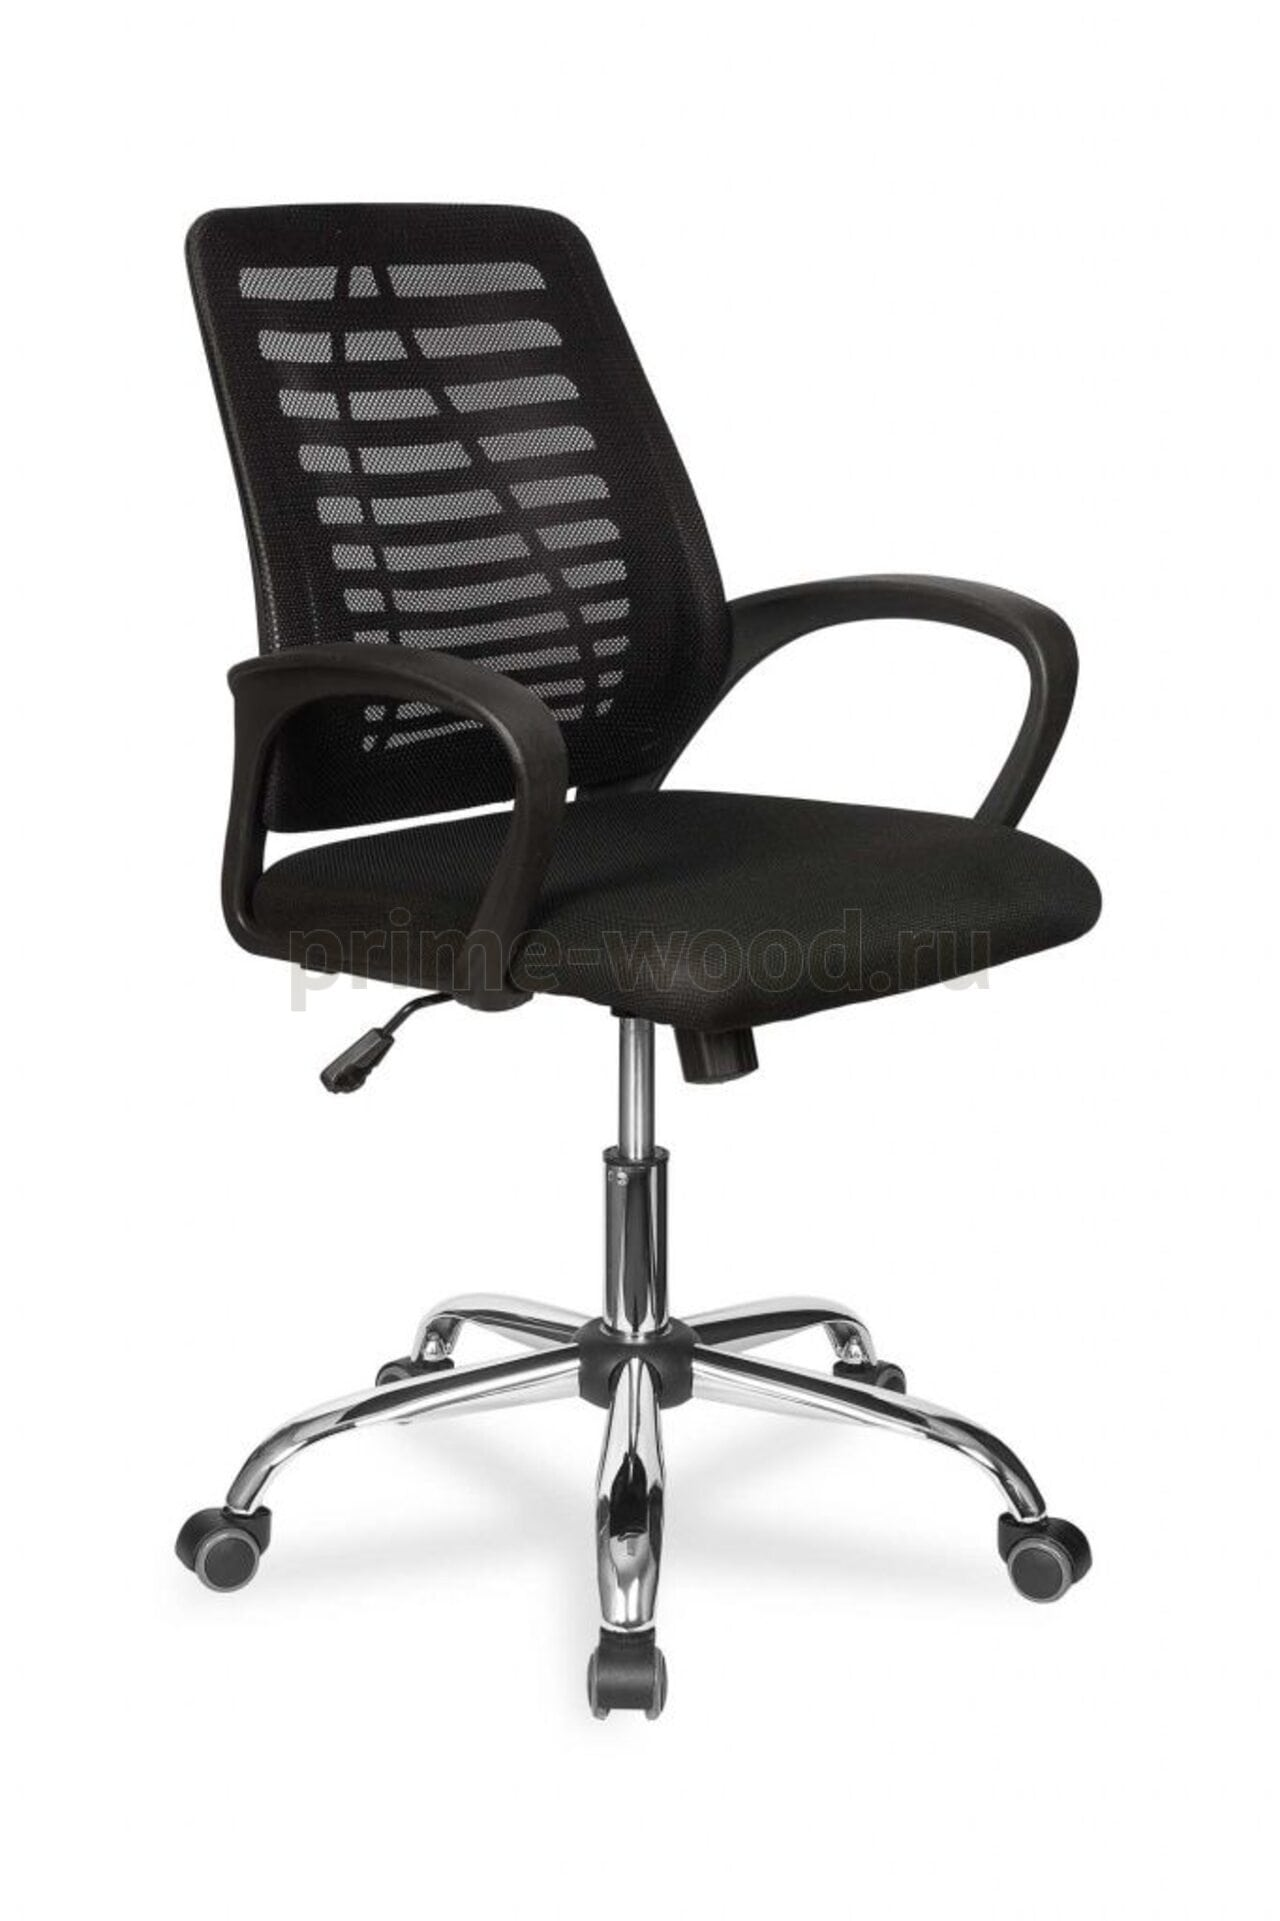 Кресло руководителя College CLG-422 MXH-B - фото 1